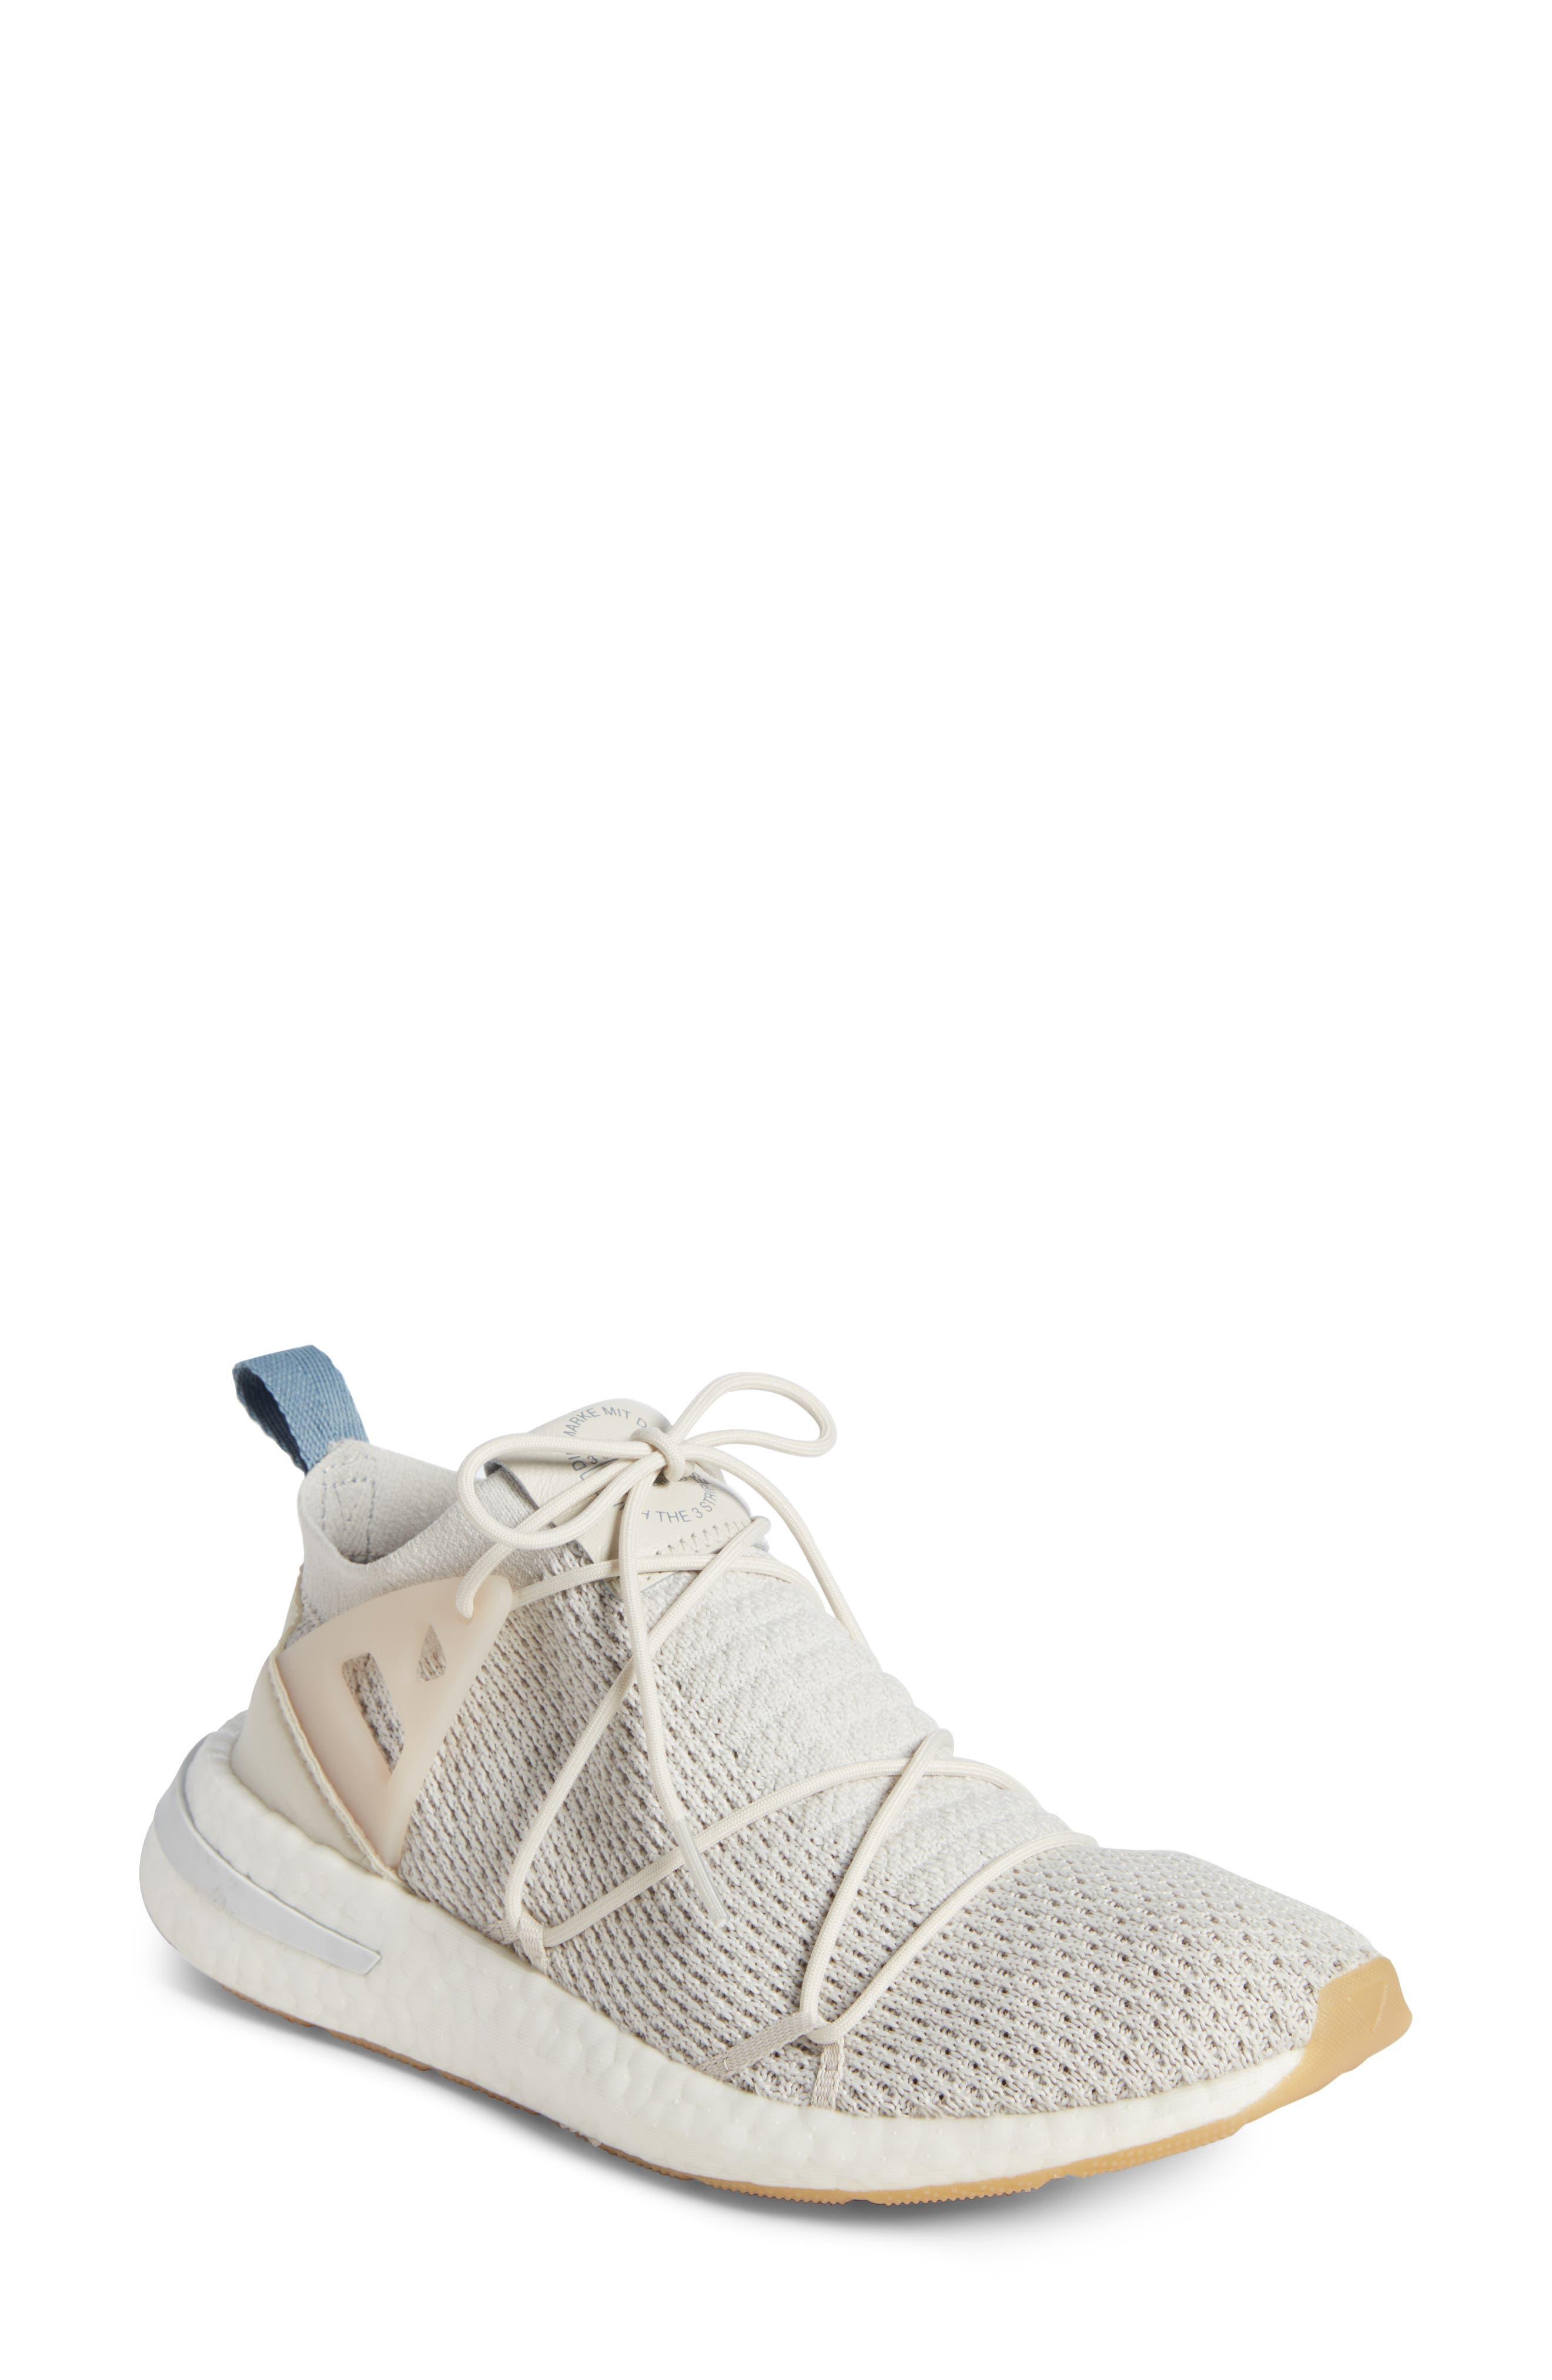 Arkyn Primeknit Sneaker,                             Main thumbnail 1, color,                             TALC/ TALC/ LINEN